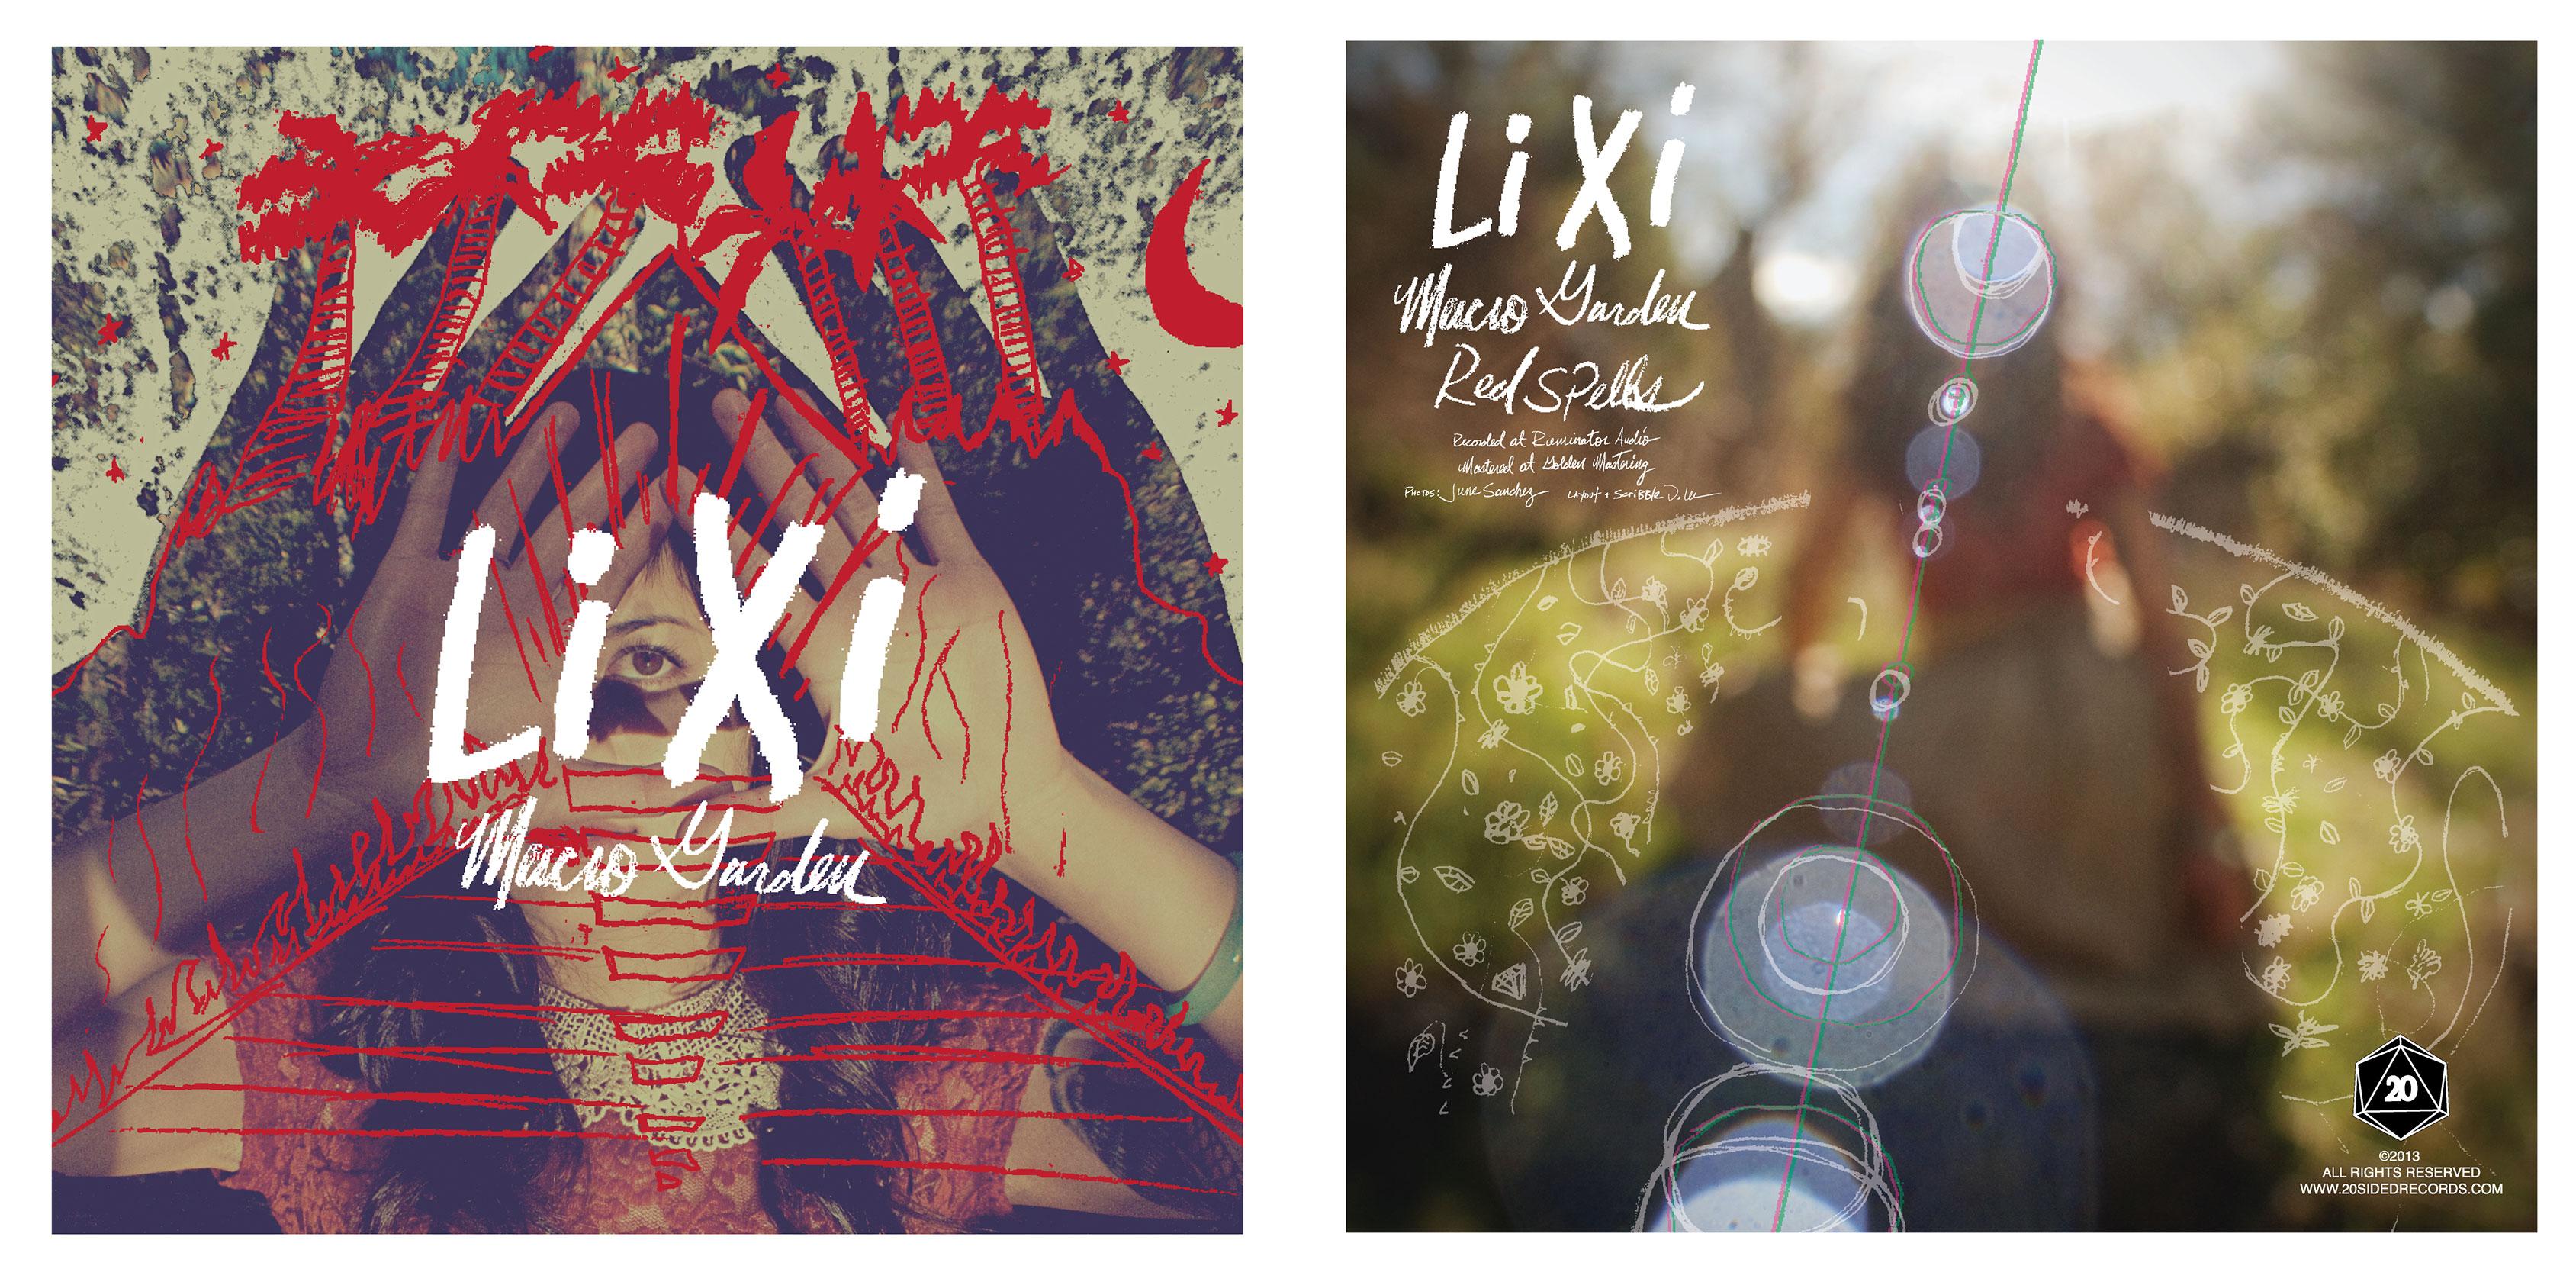 lixi_7artwork